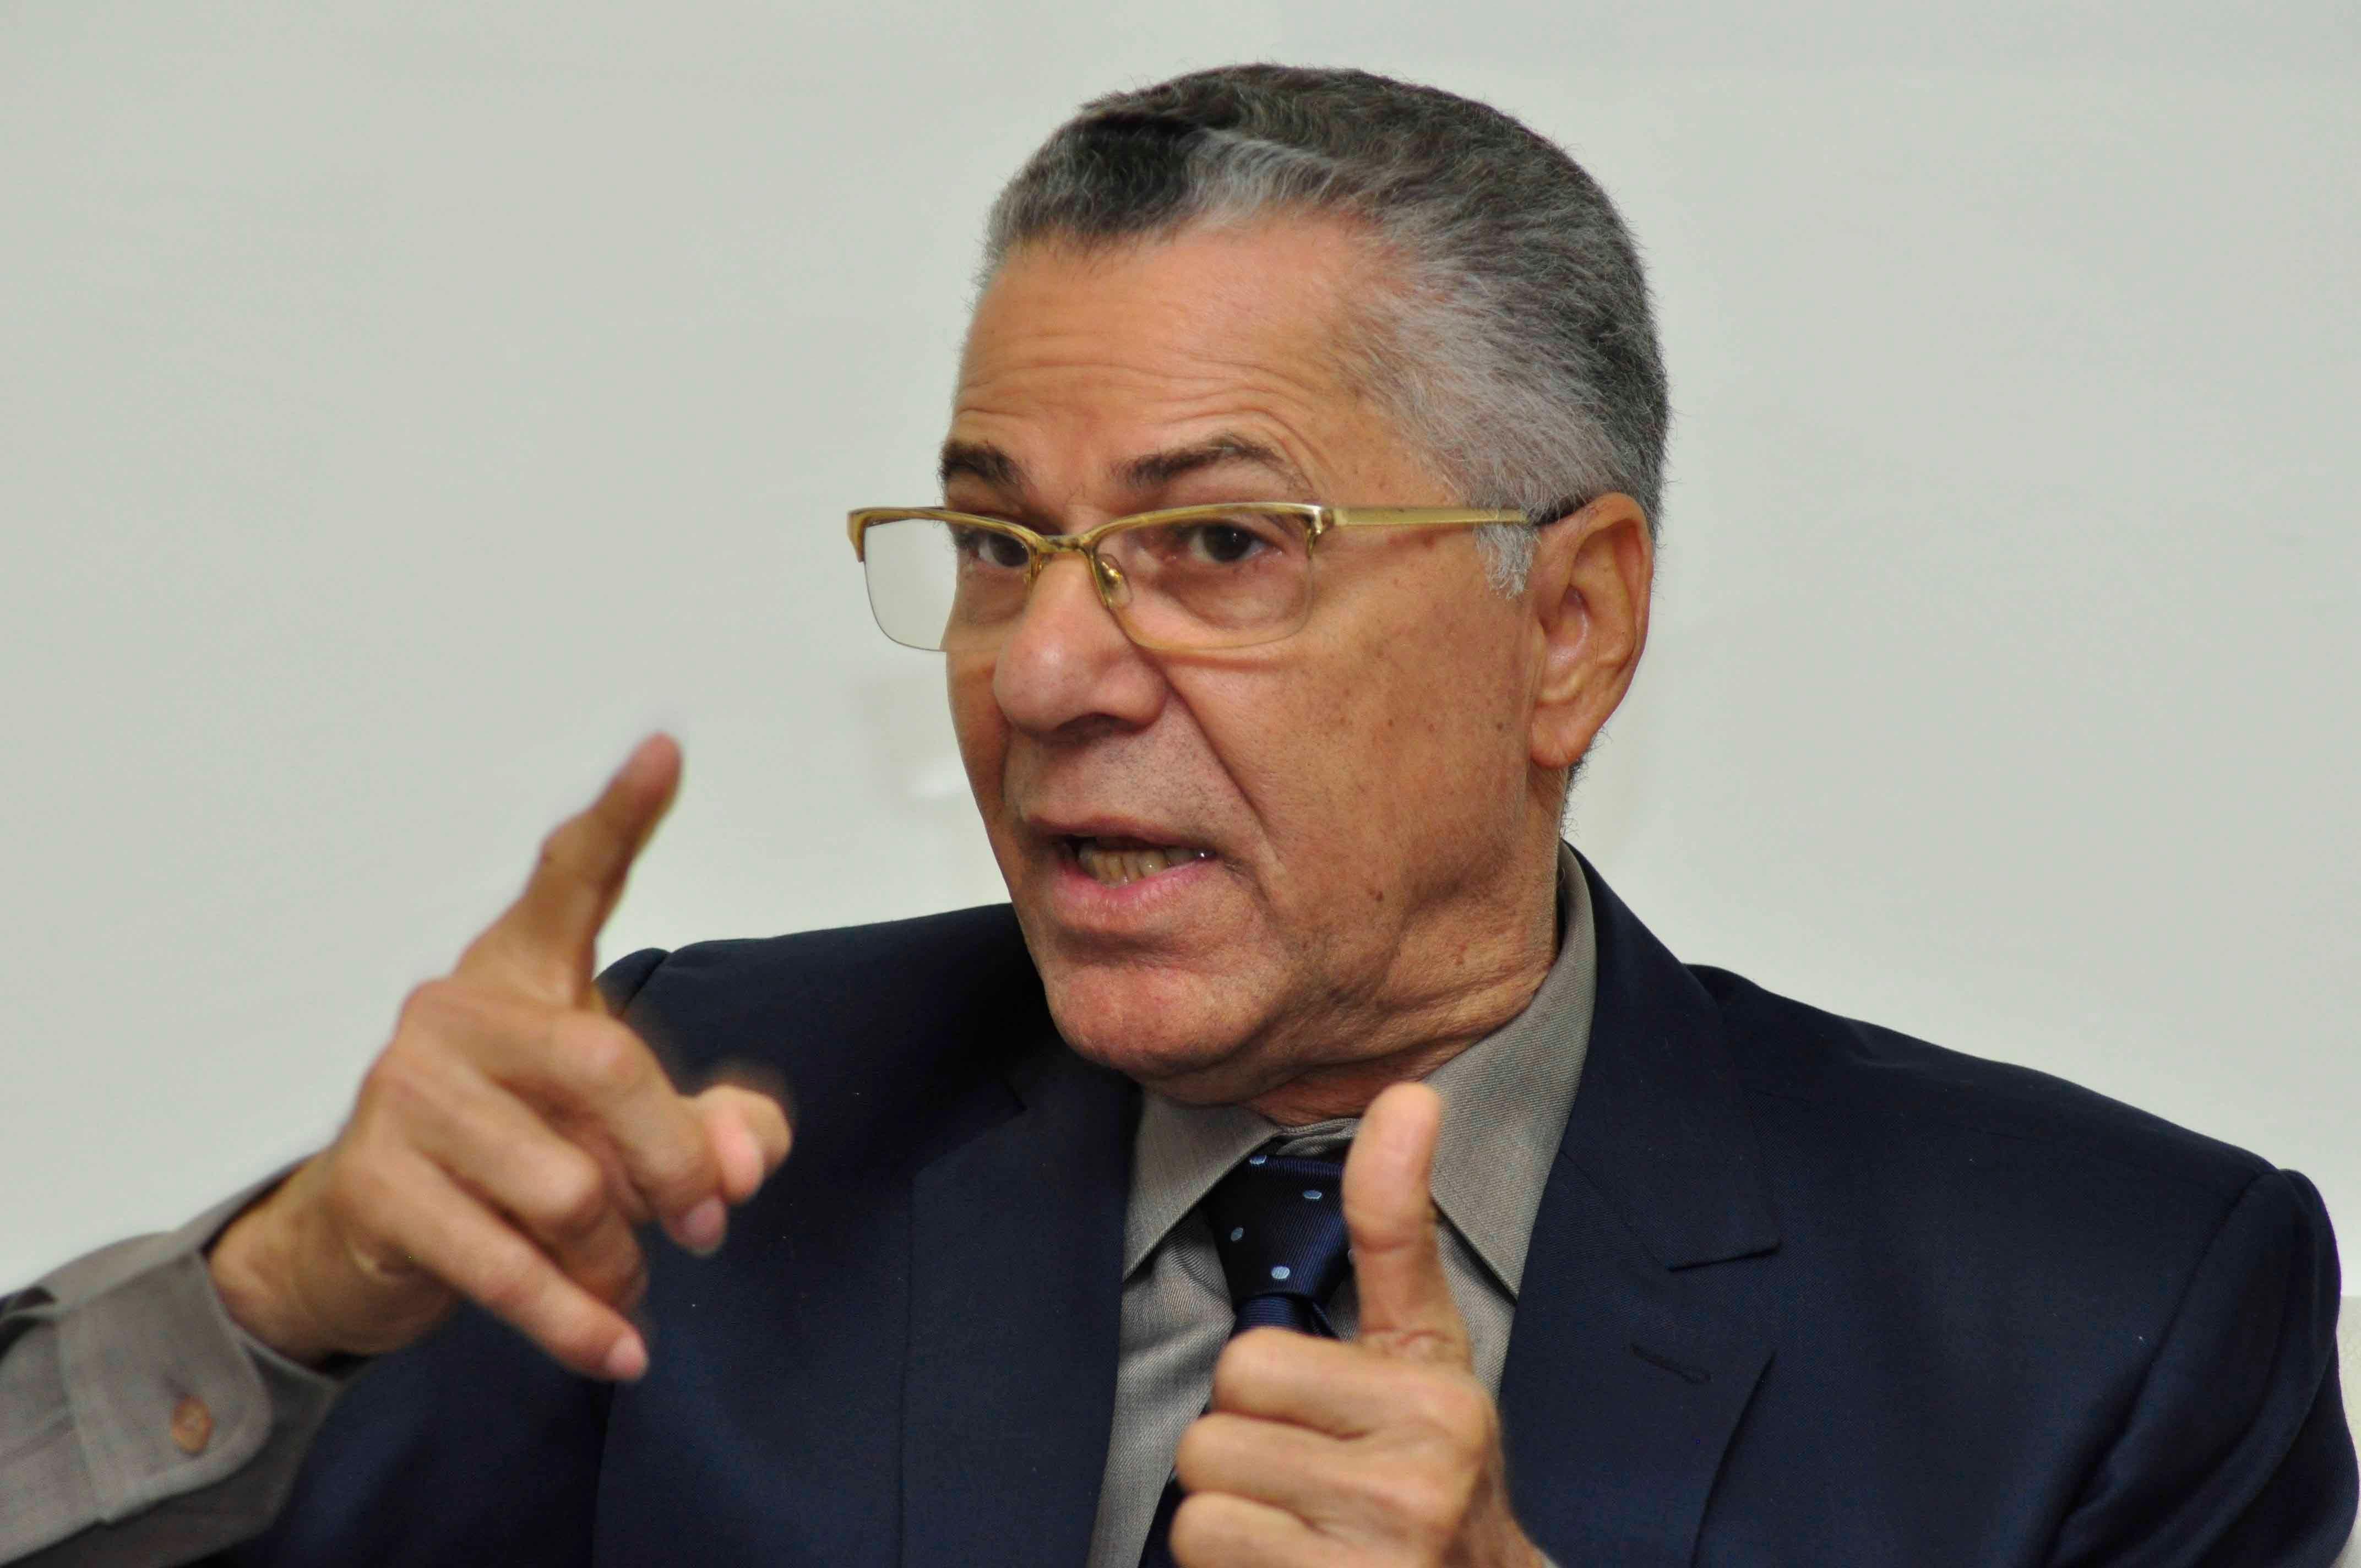 Alcaldía SDE invita a candidatos a jornada de retiro de propaganda política